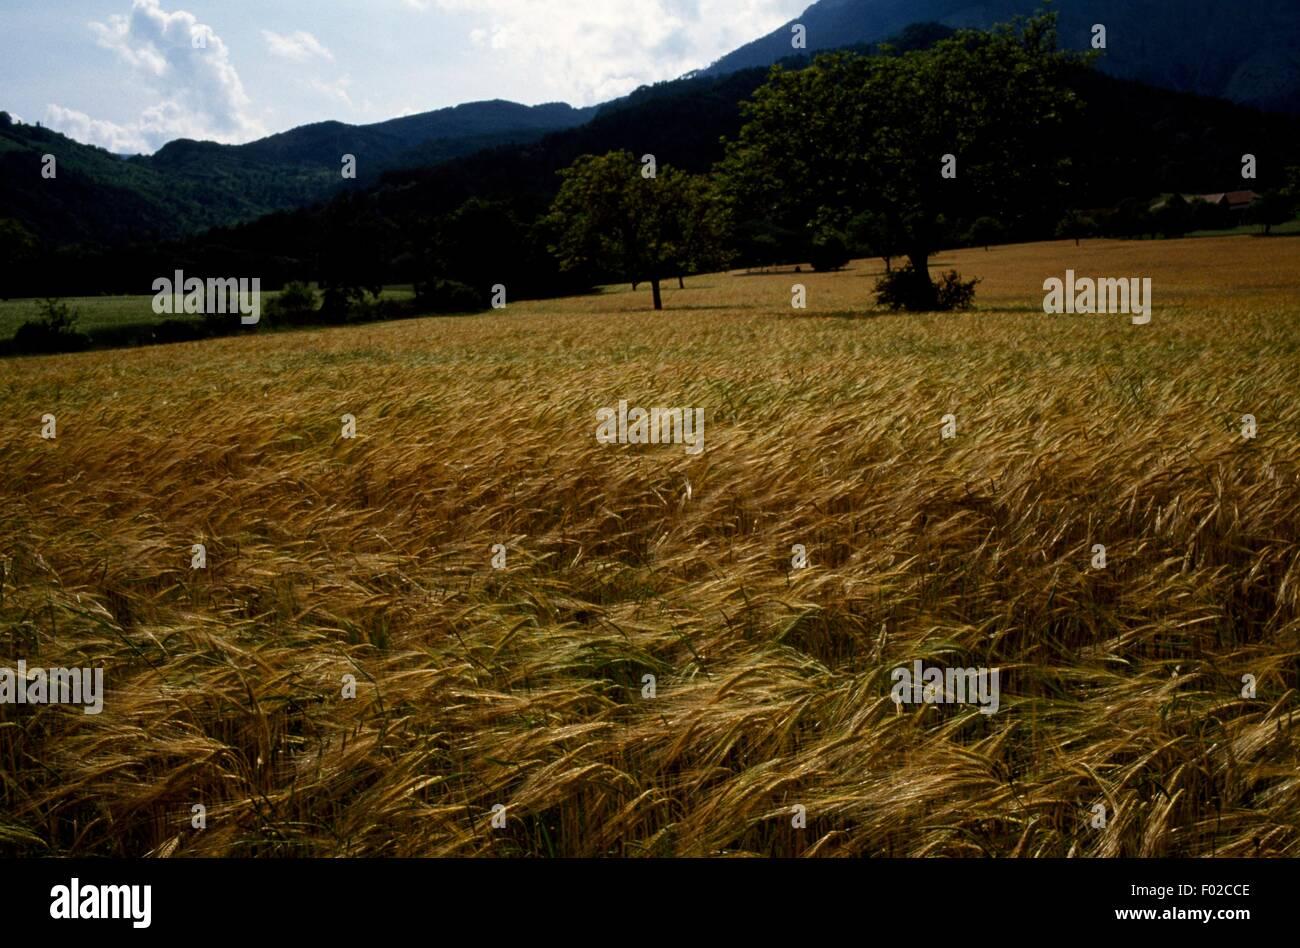 Barley field nearby Luc en Diois, Vercors Regional Natural Park (Parc naturel regional du Vercors), Drome, France. - Stock Image